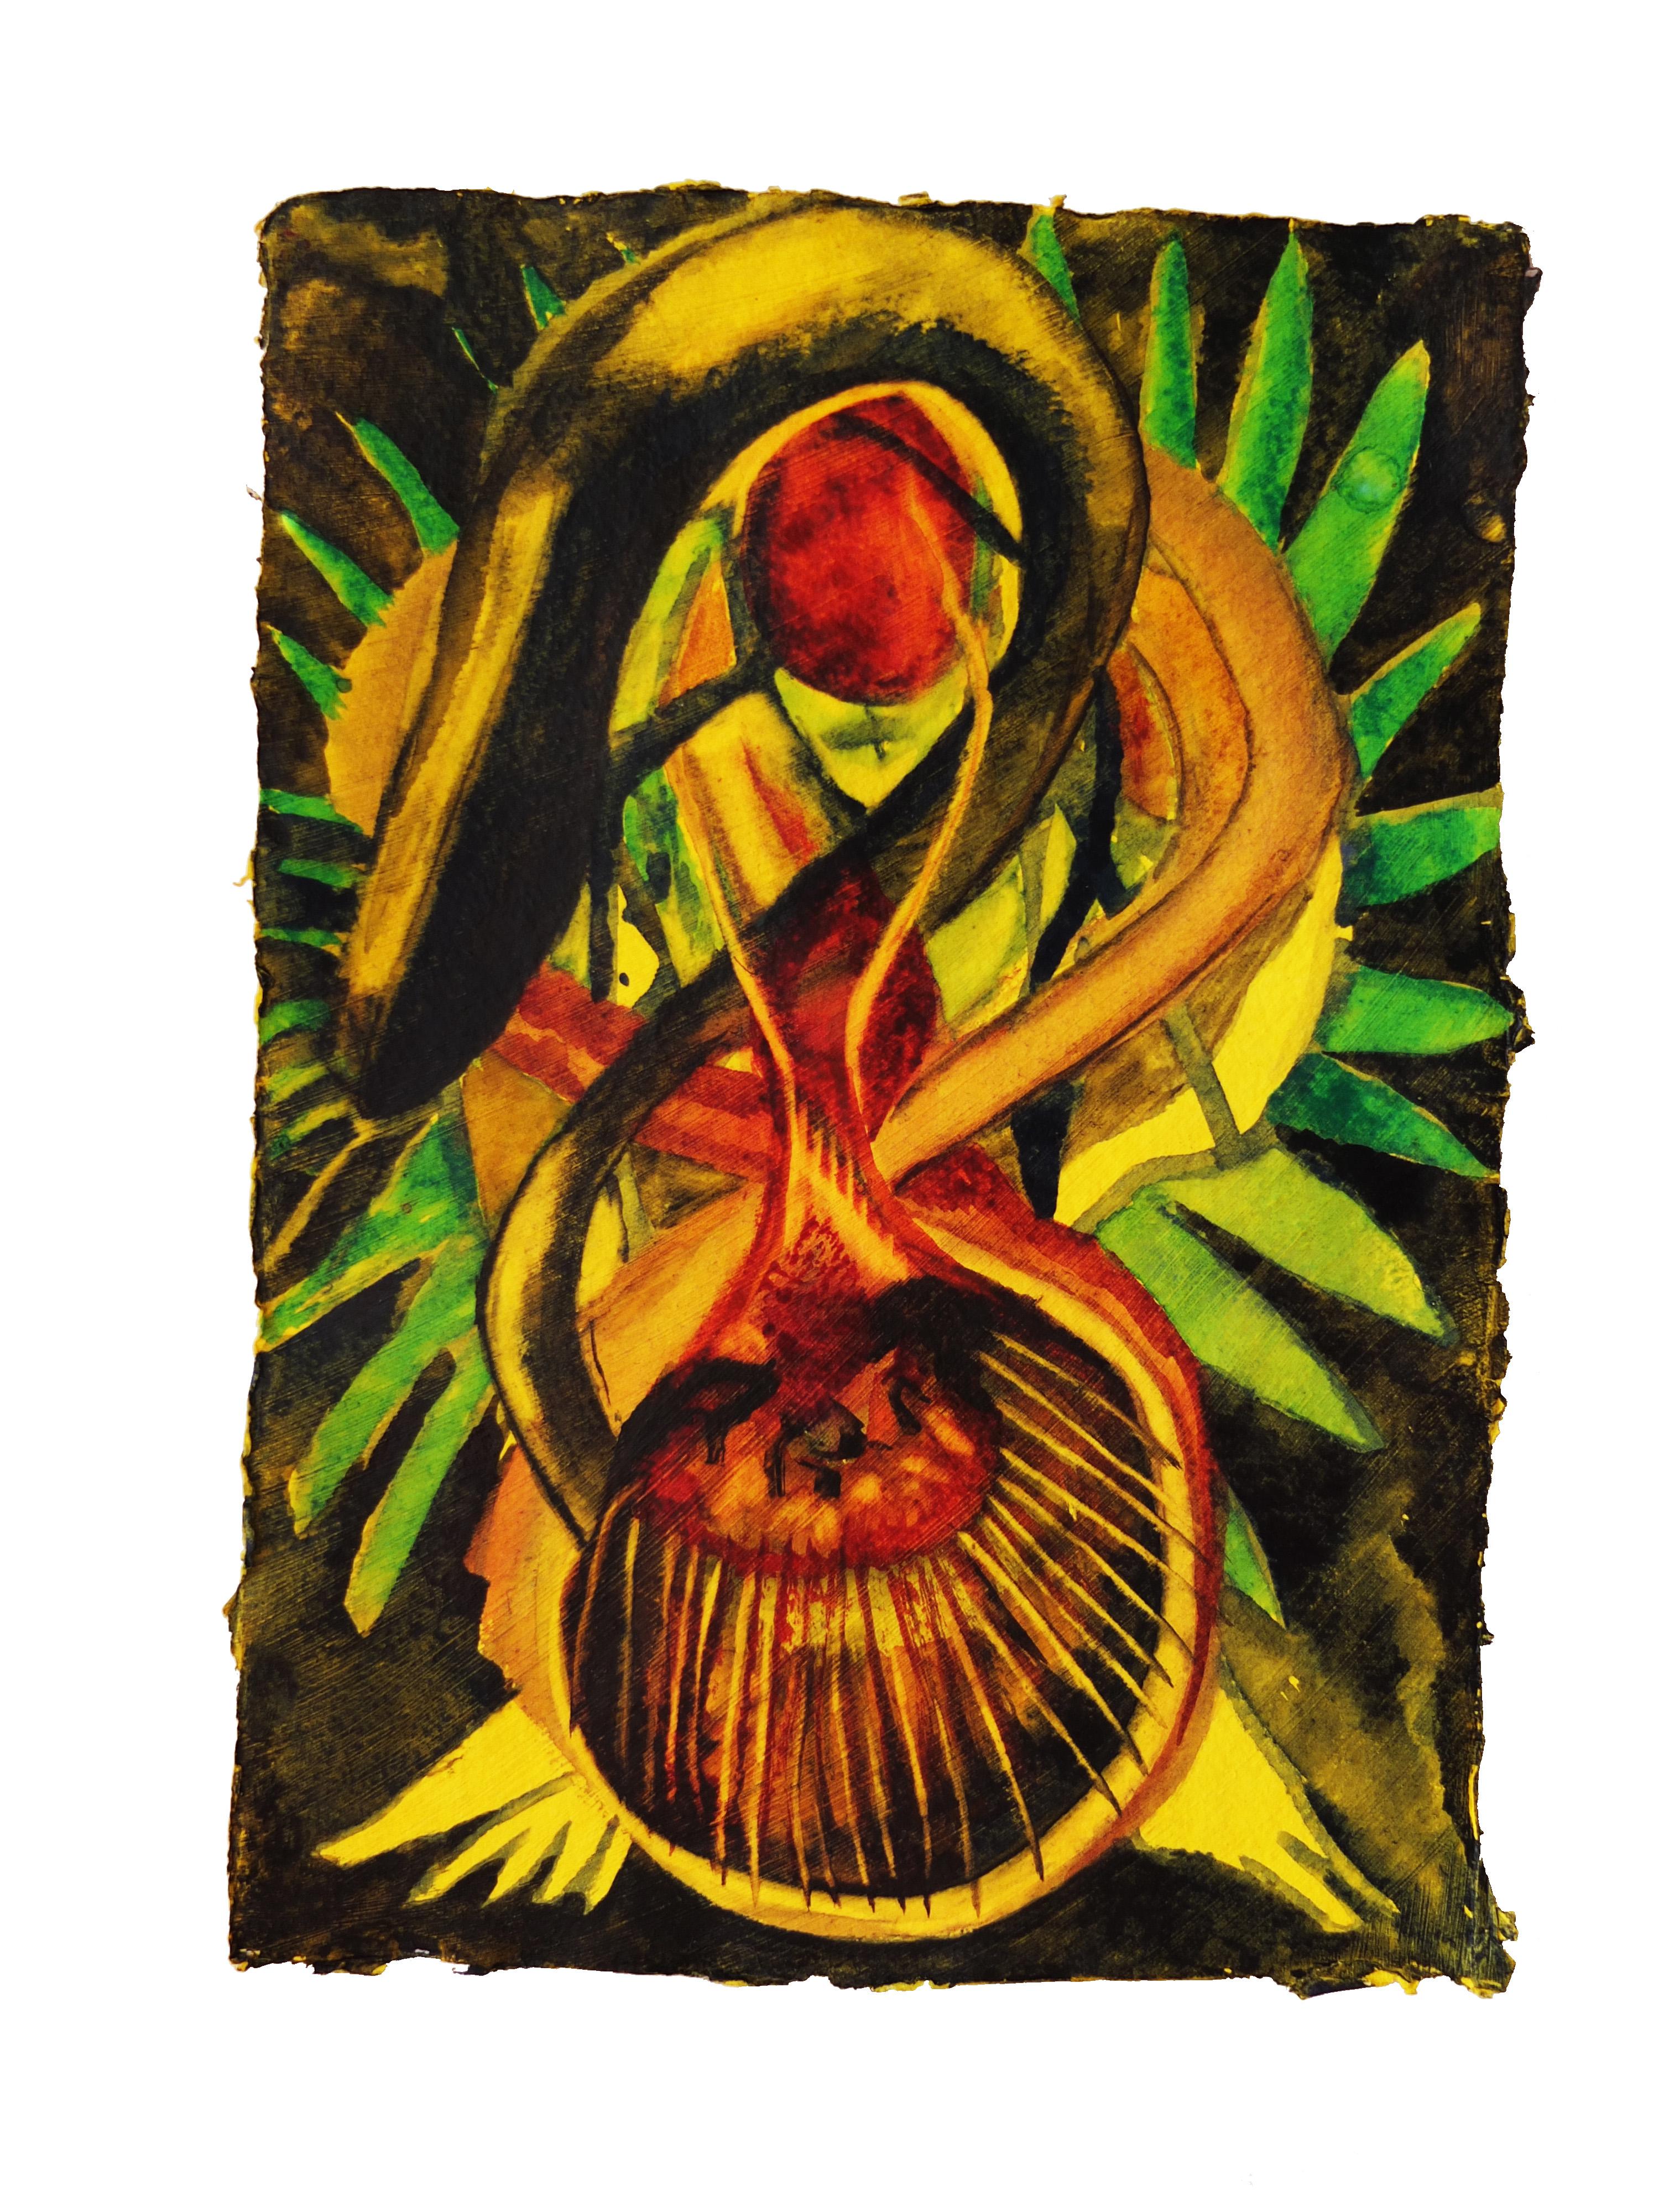 Watercolour on handmade paper, 15cm x 20cm